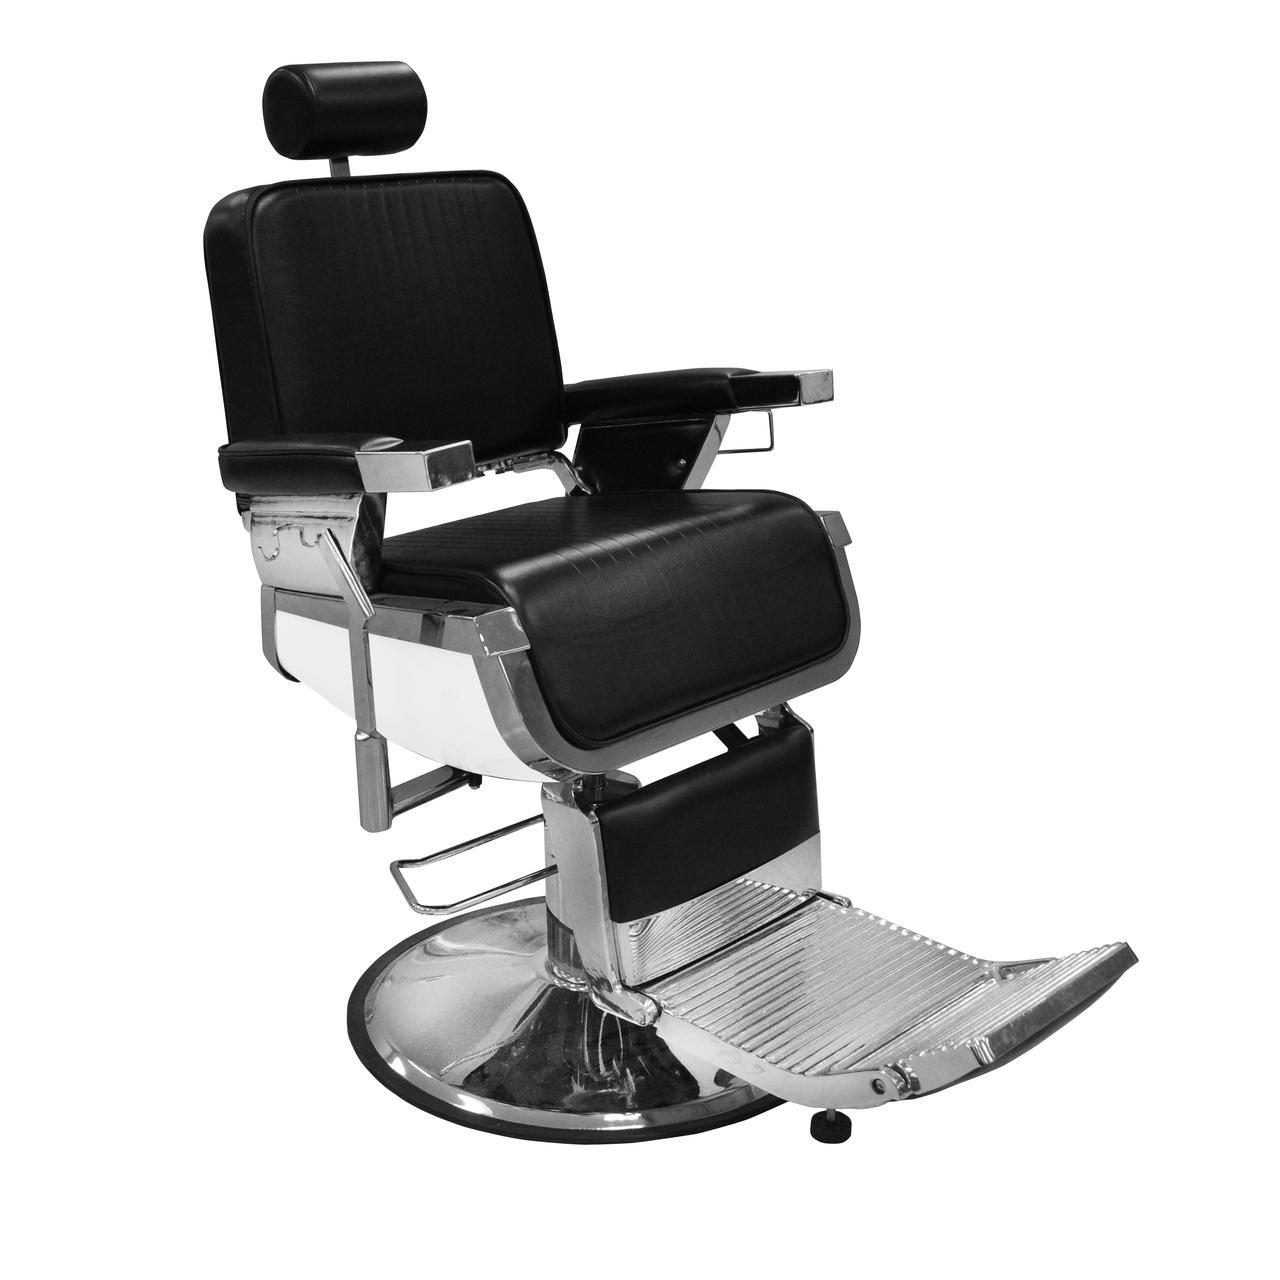 ayc-lincoln-barber-chair.jpg